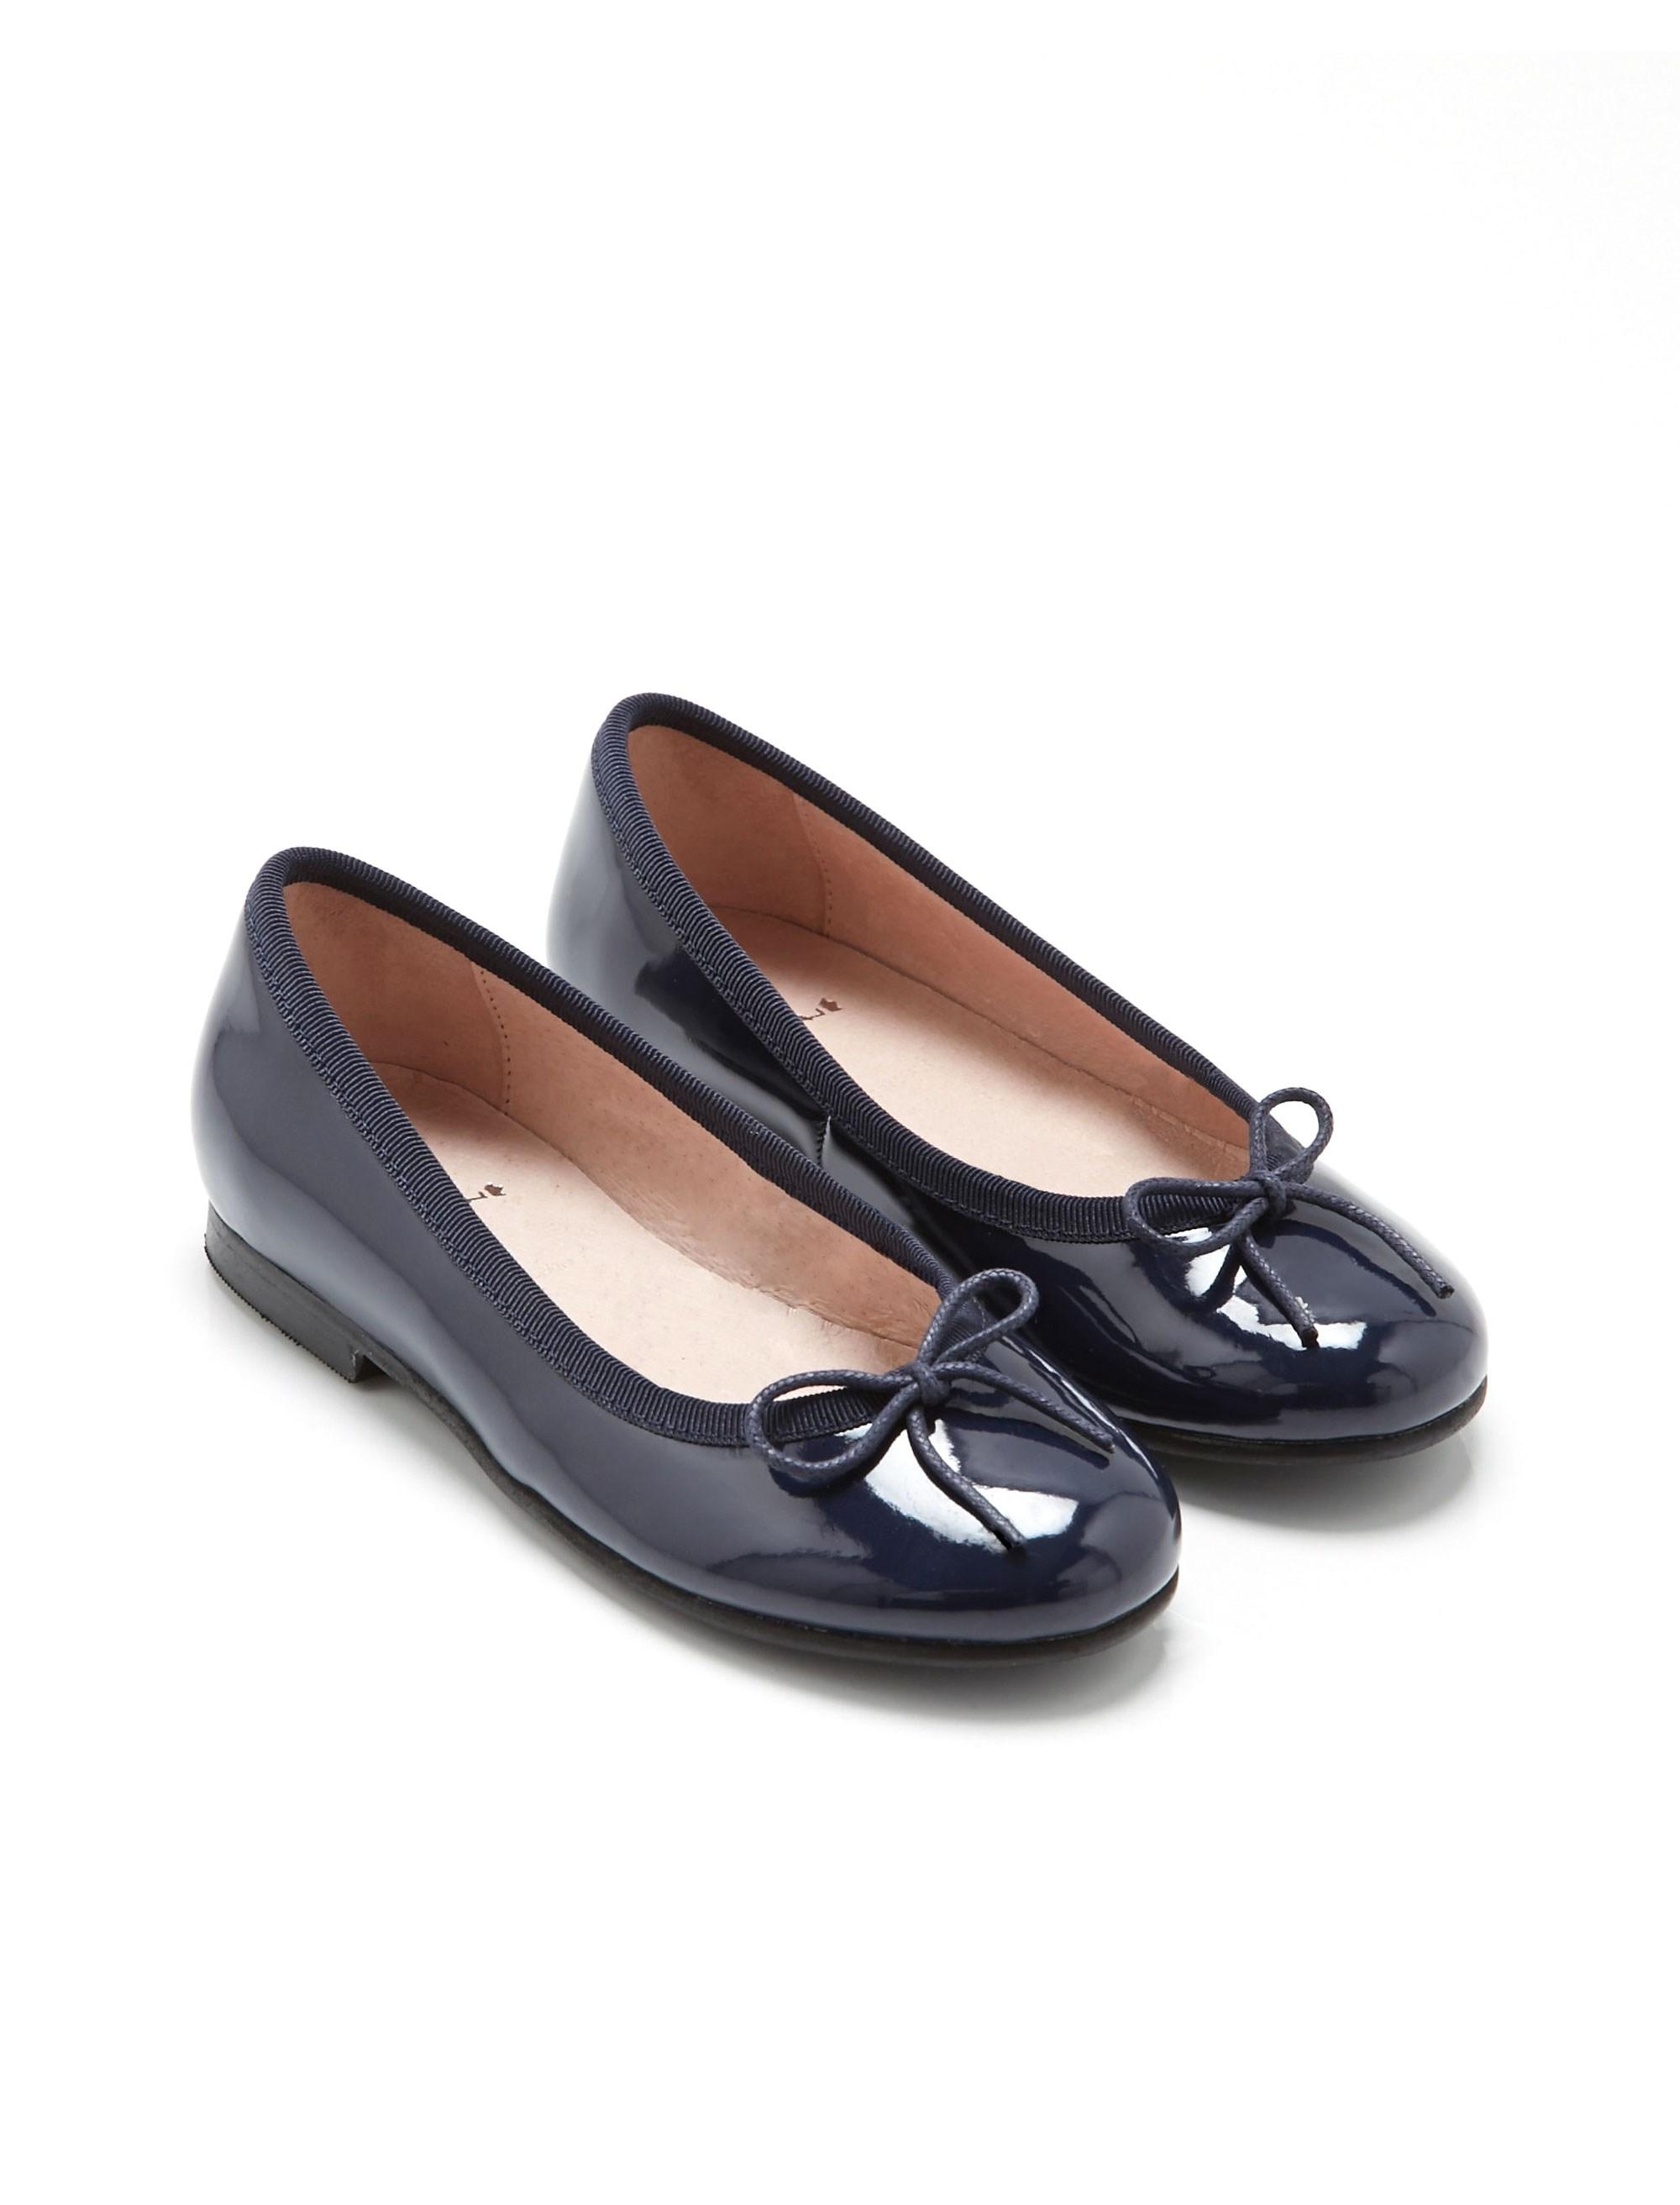 کفش چرم تخت دخترانه Dittle - جاکادی